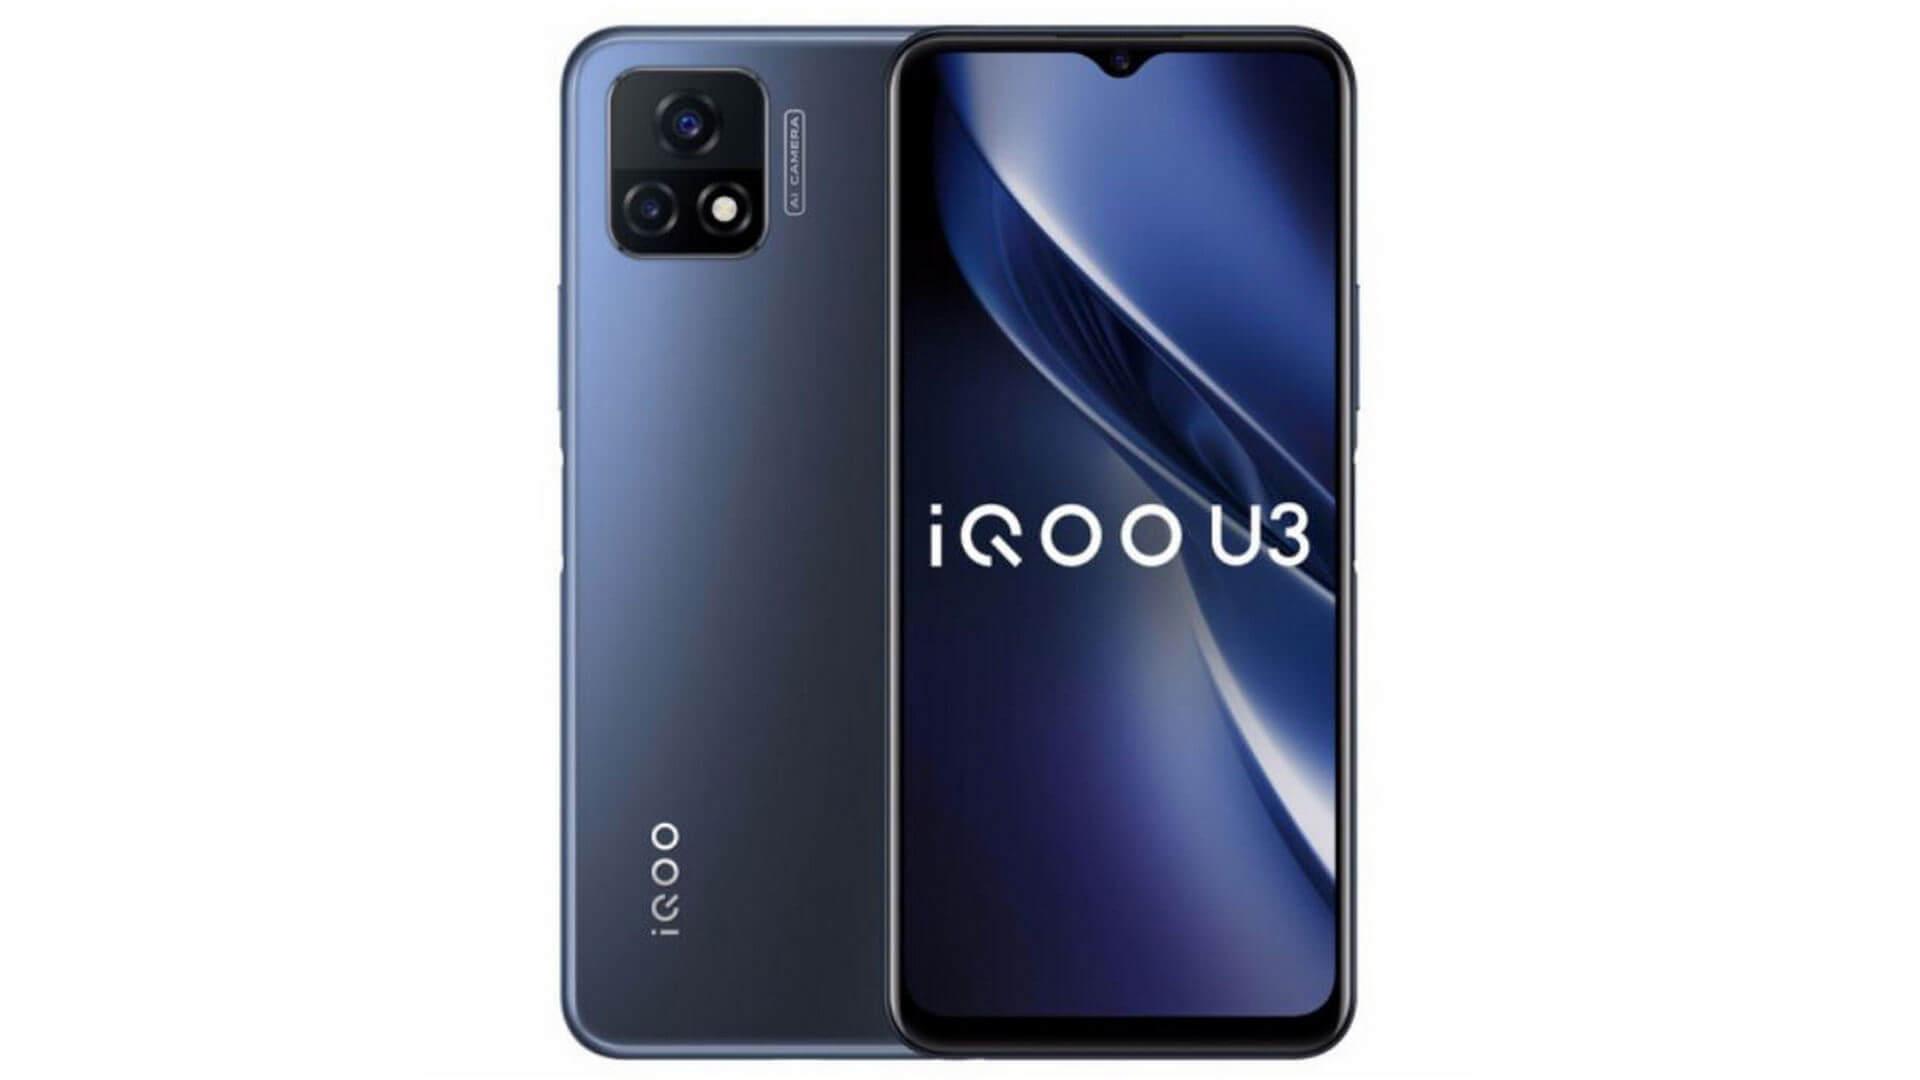 iQOO представила смартфон U3 с 90-Гц дисплеем